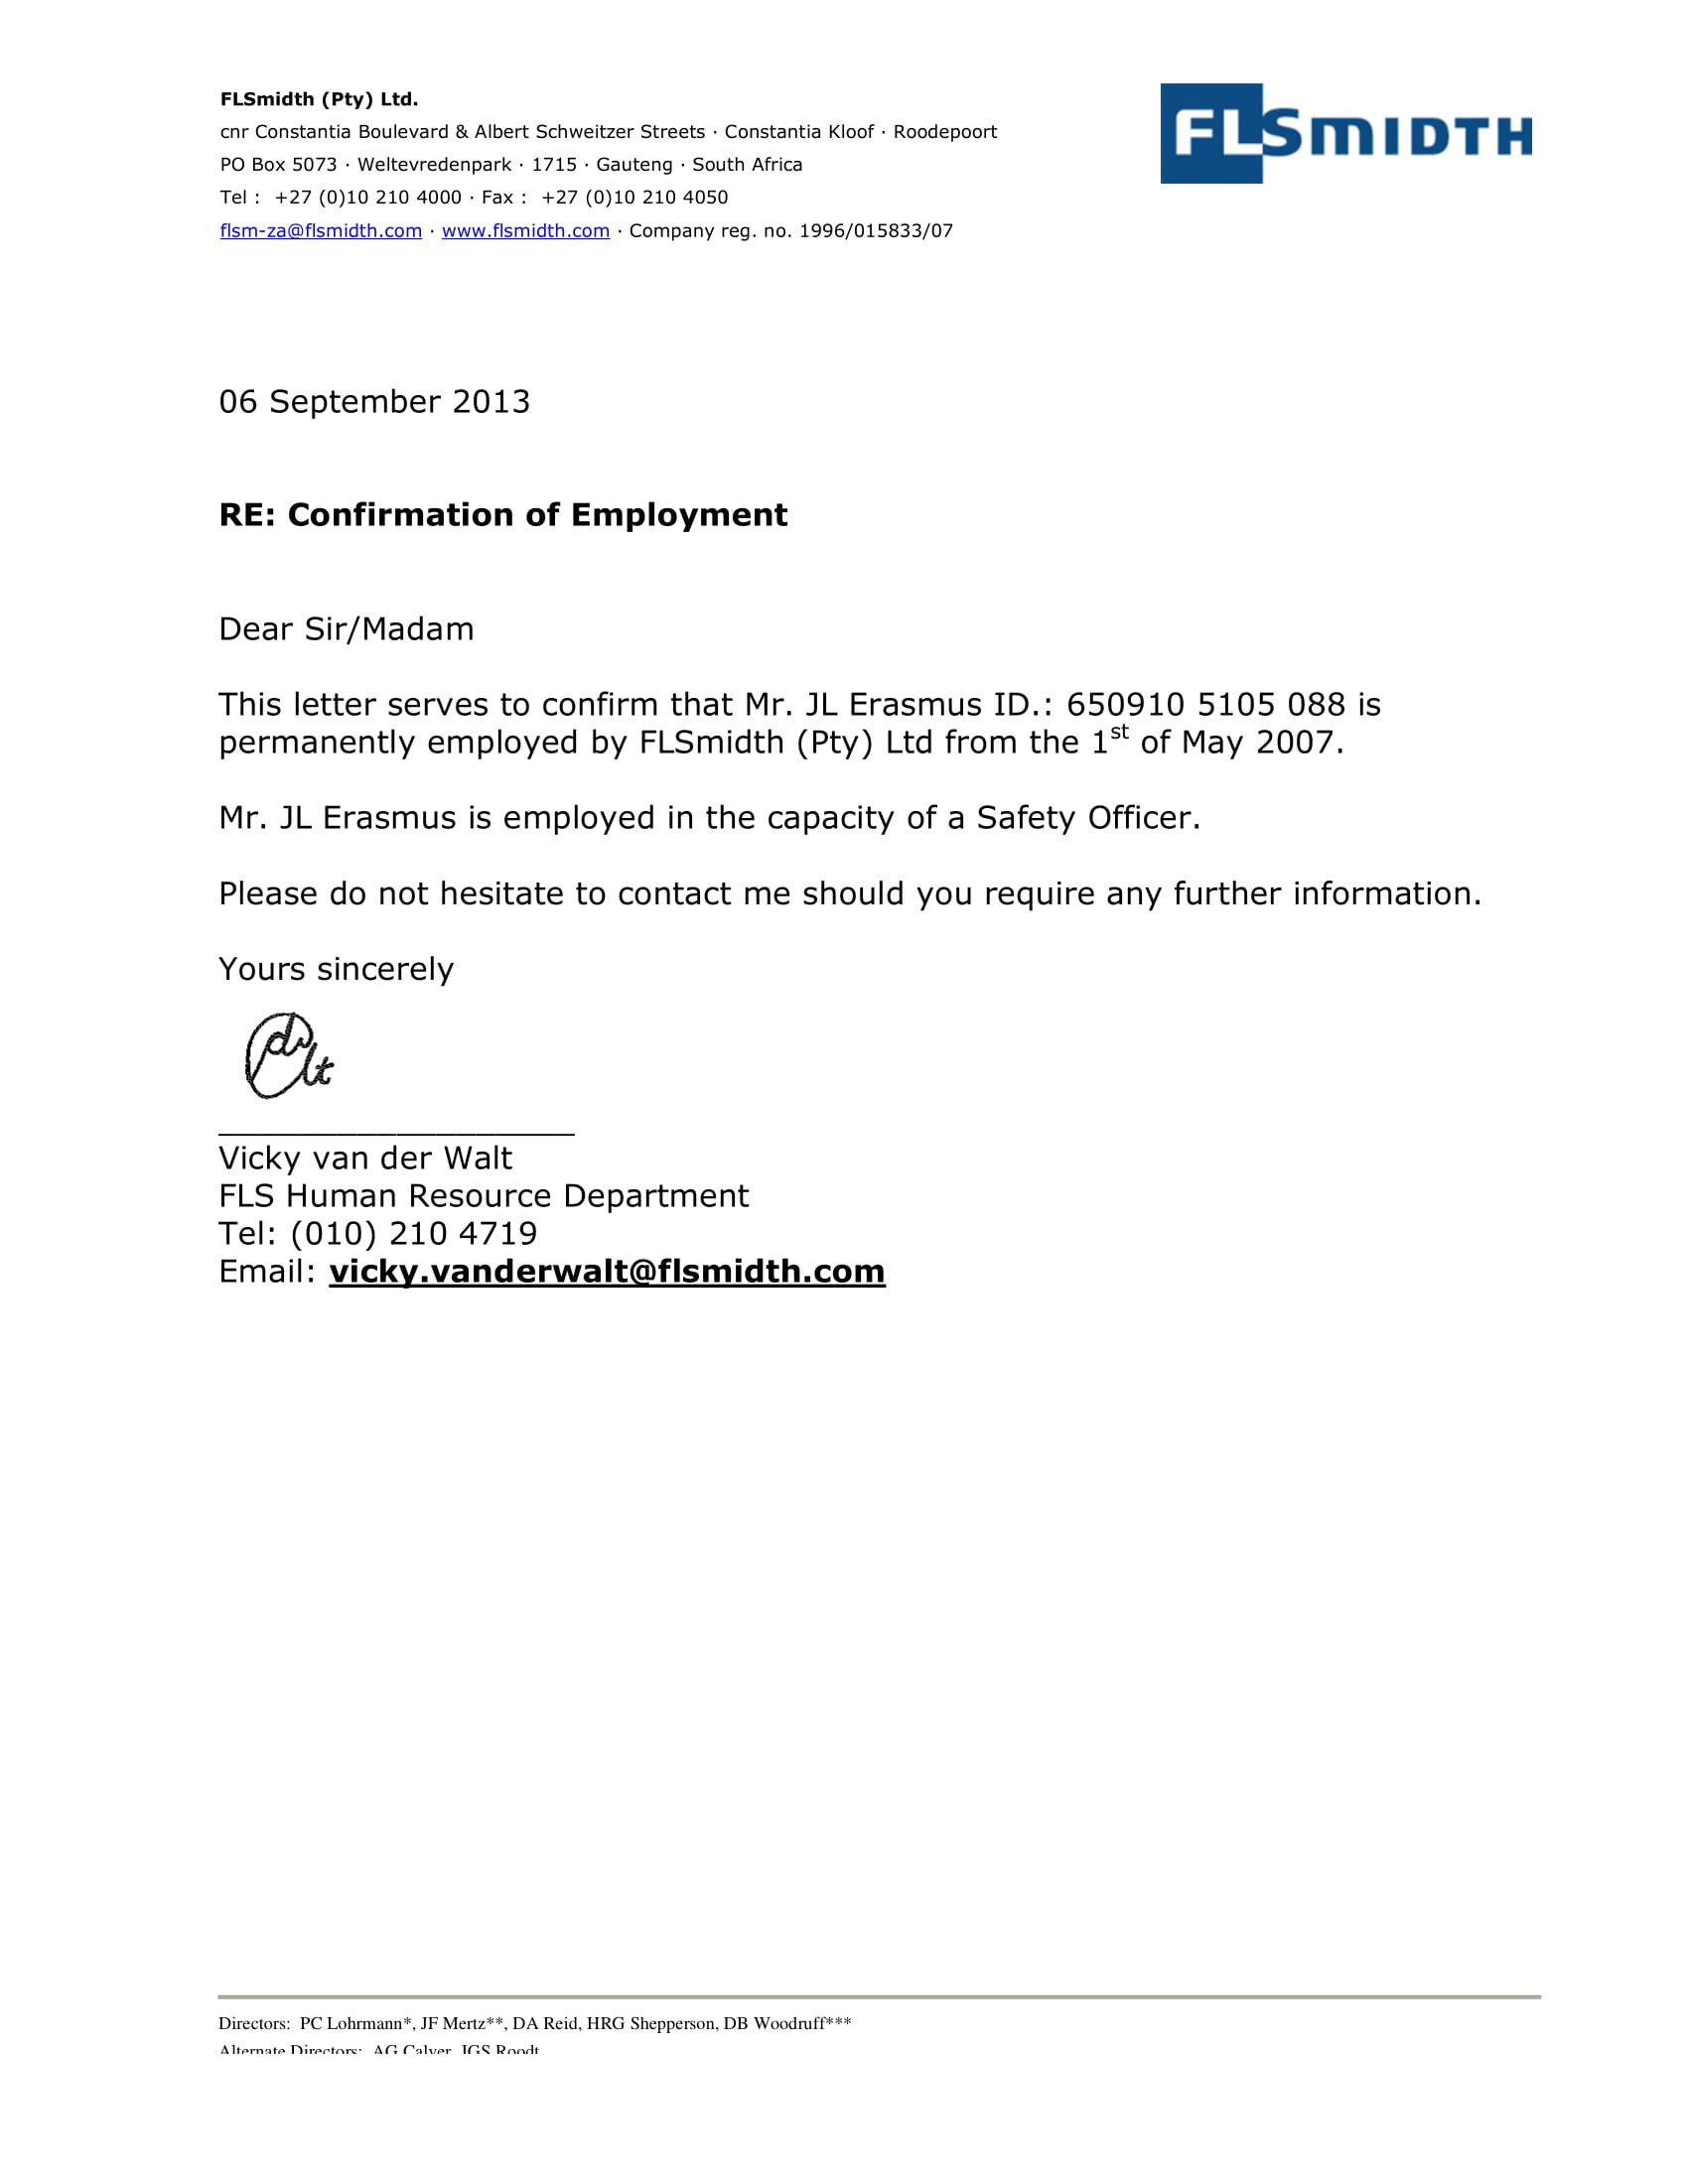 Employee Verification Letter Template 14 Employment Verification Letter Examples Pdf Doc